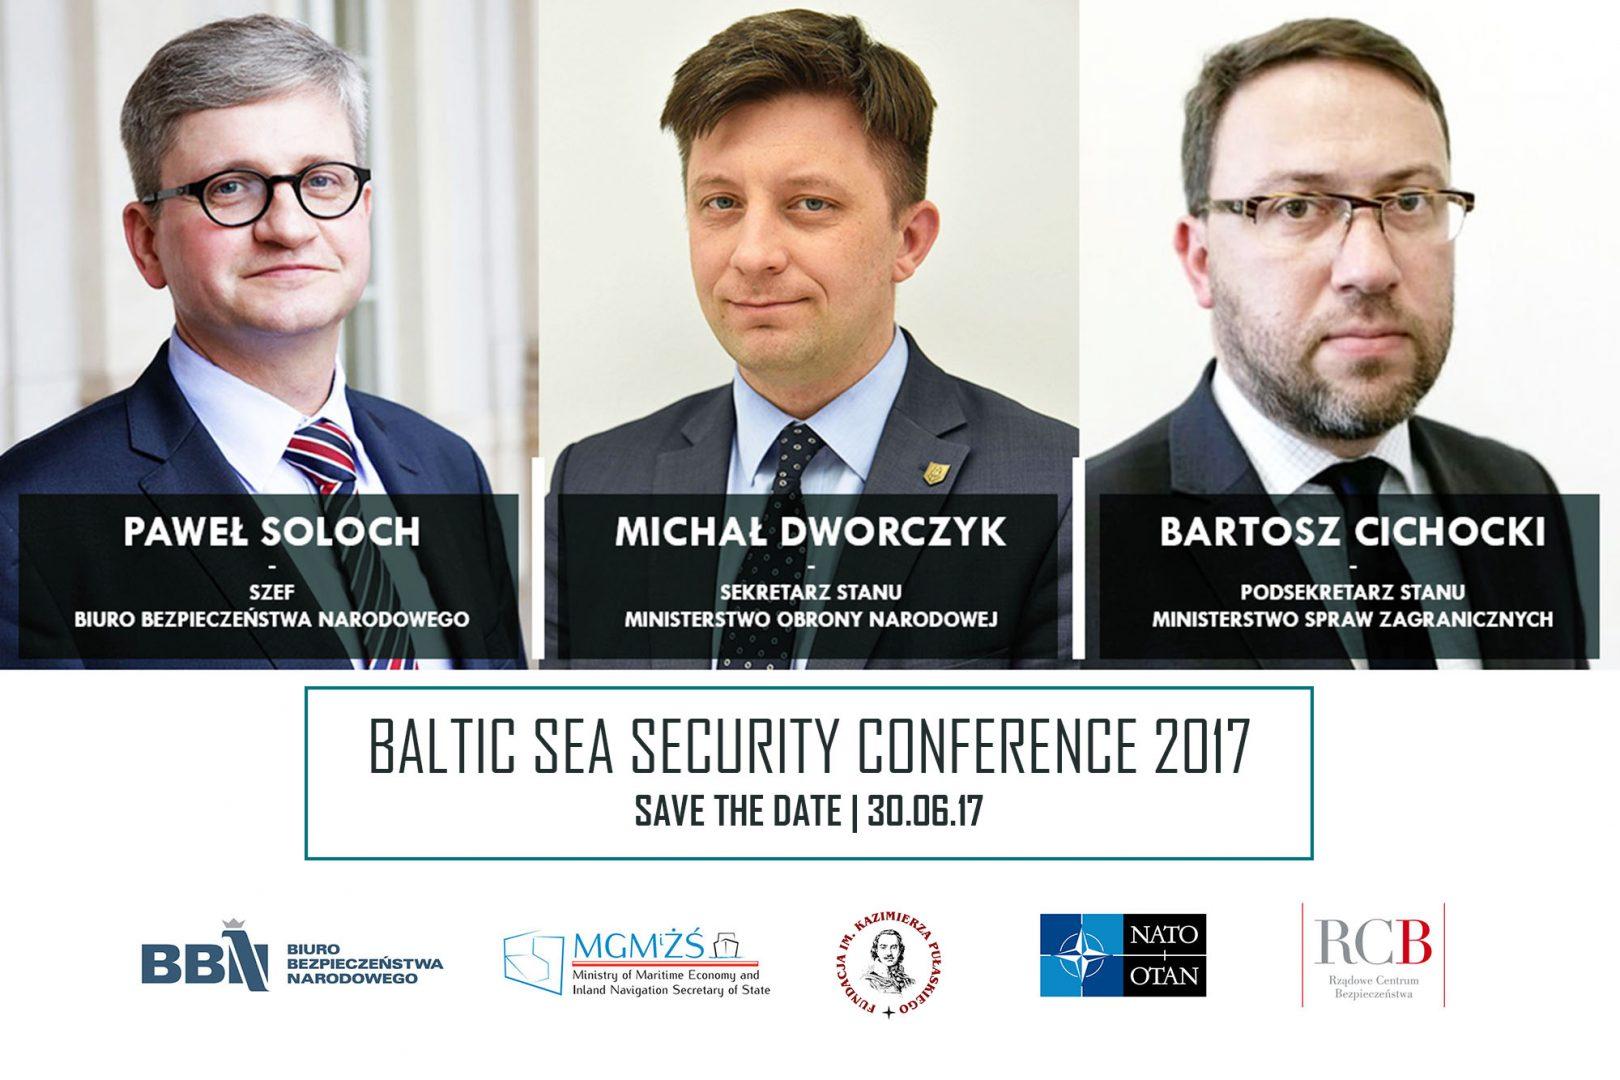 Ministers Paweł Soloch, Michał Dworczyk and Bartosz Cichocki to open Baltic Sea Security Conference 2017